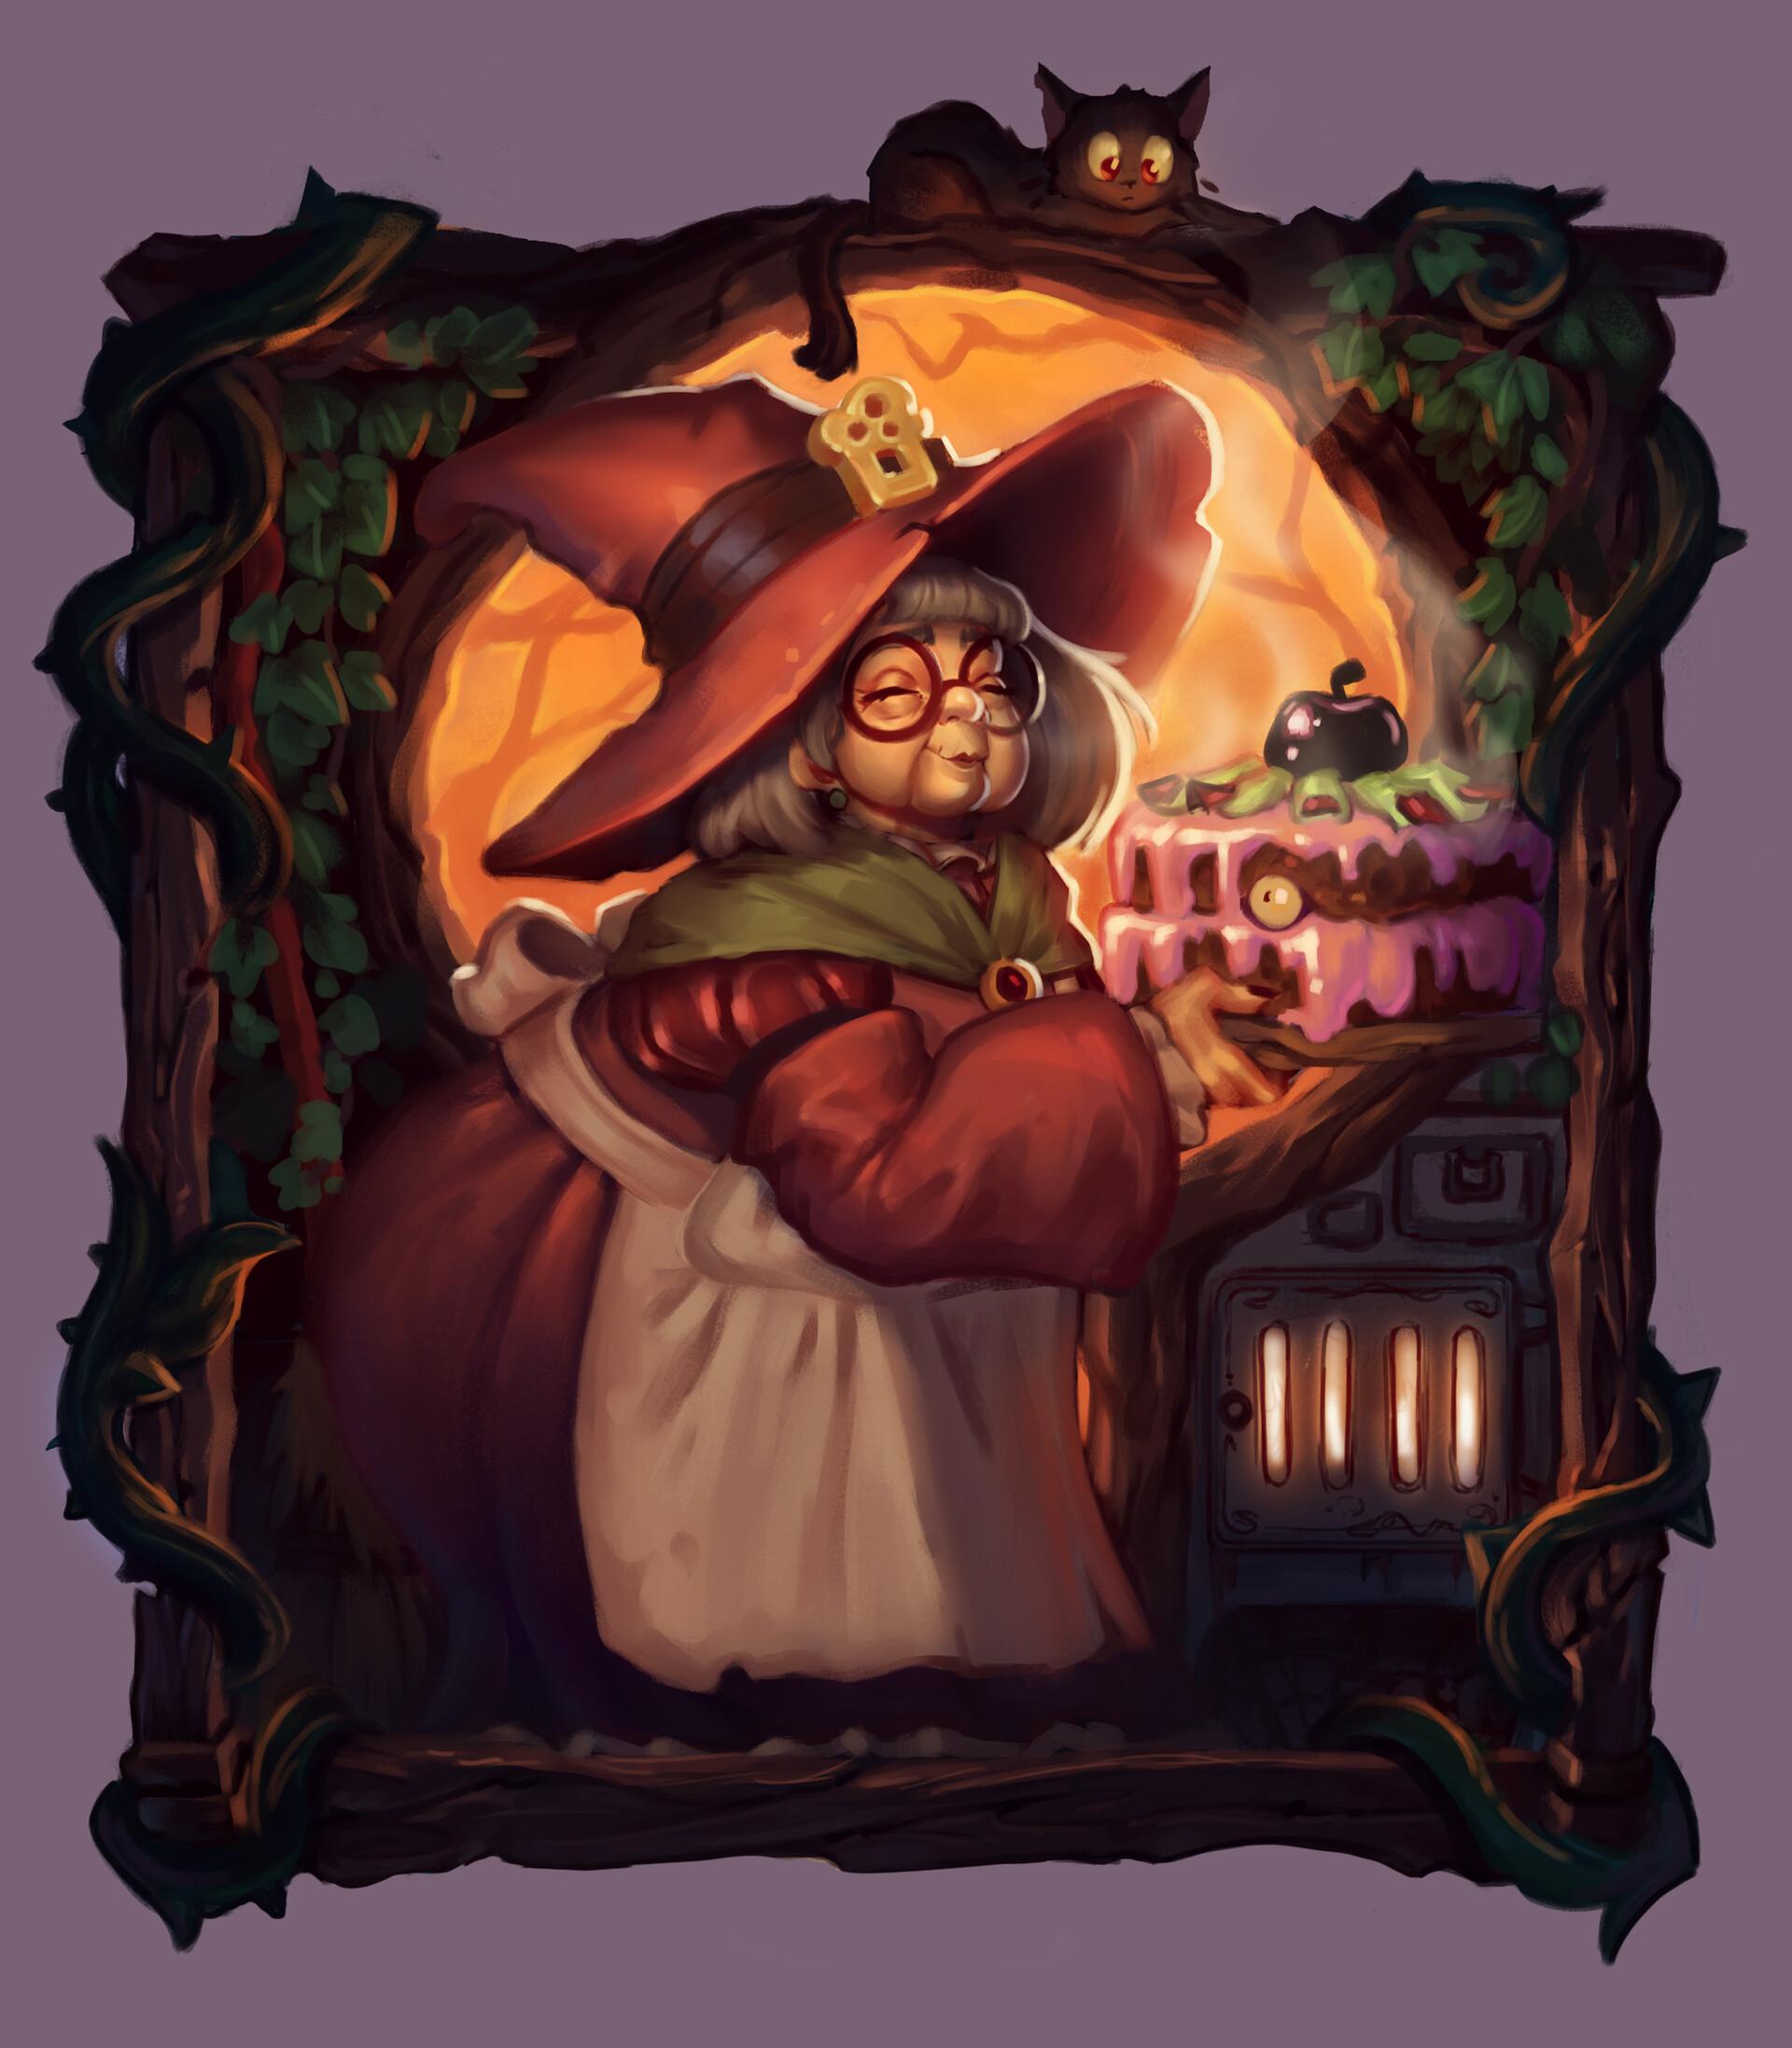 Anthea zammit granny evil cake